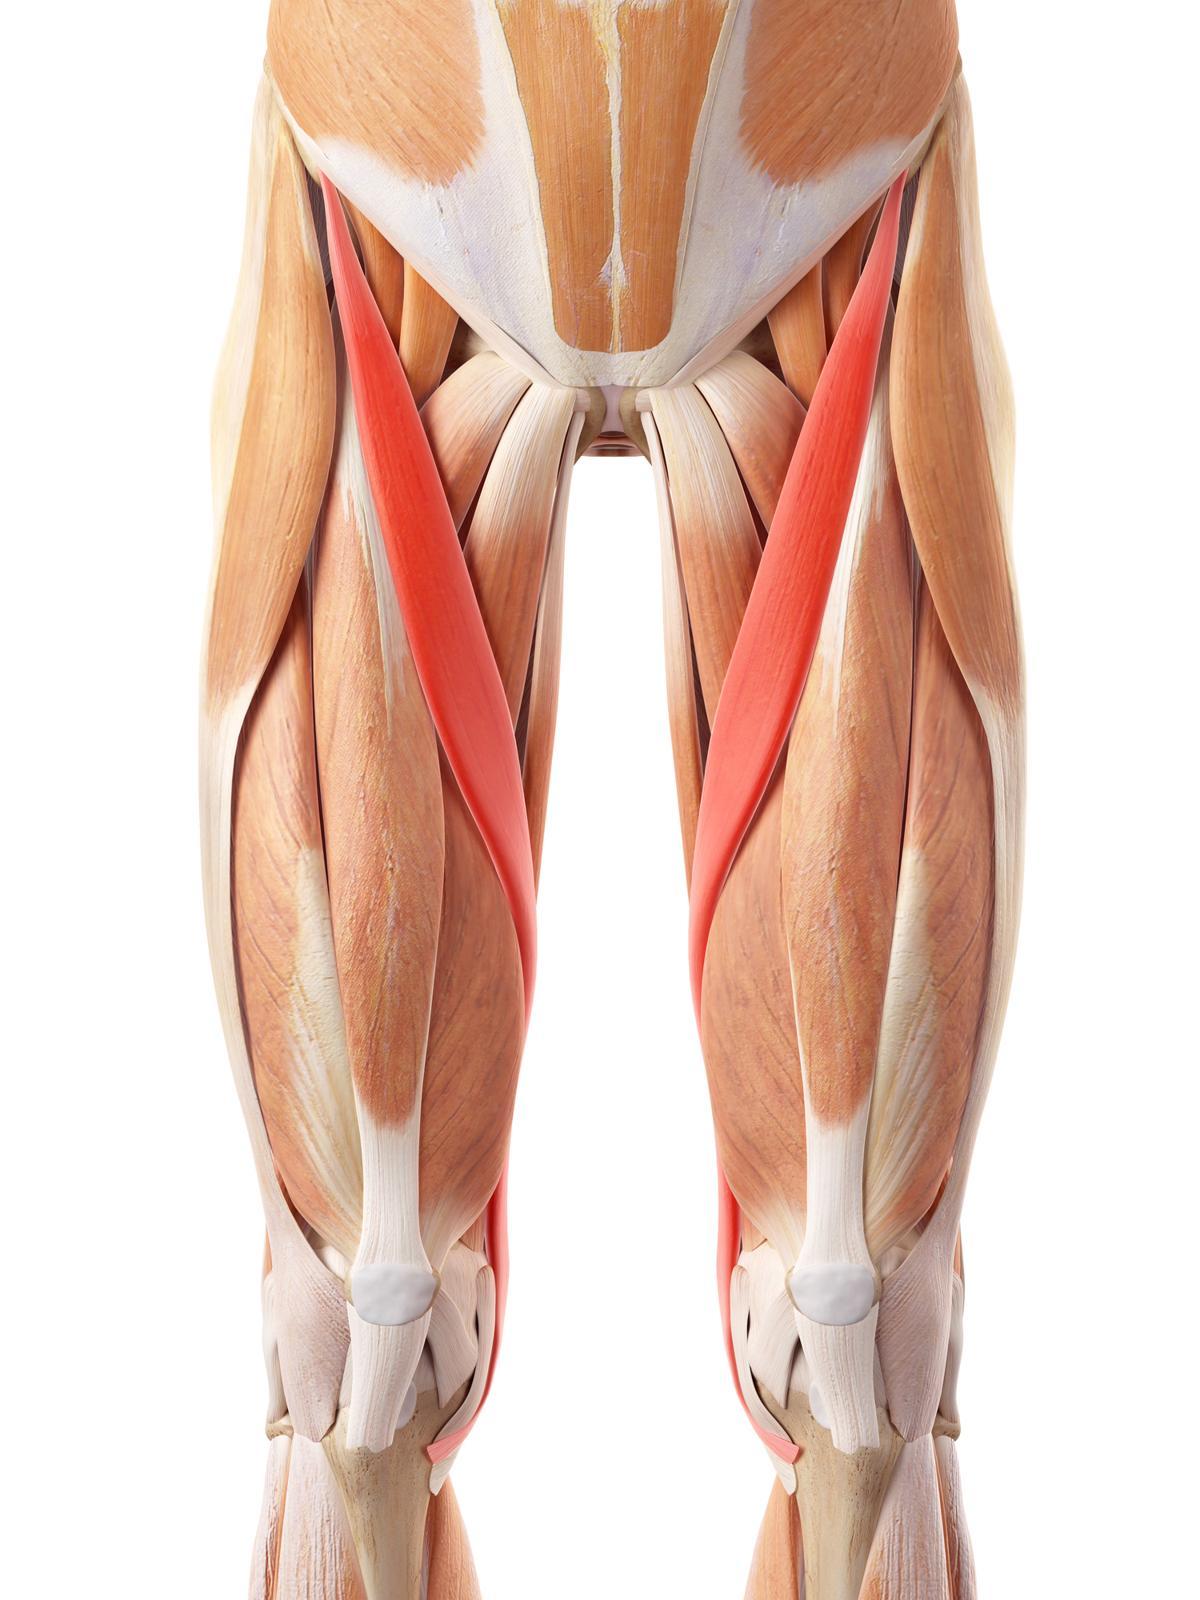 1200 486591468 sartorius muscle